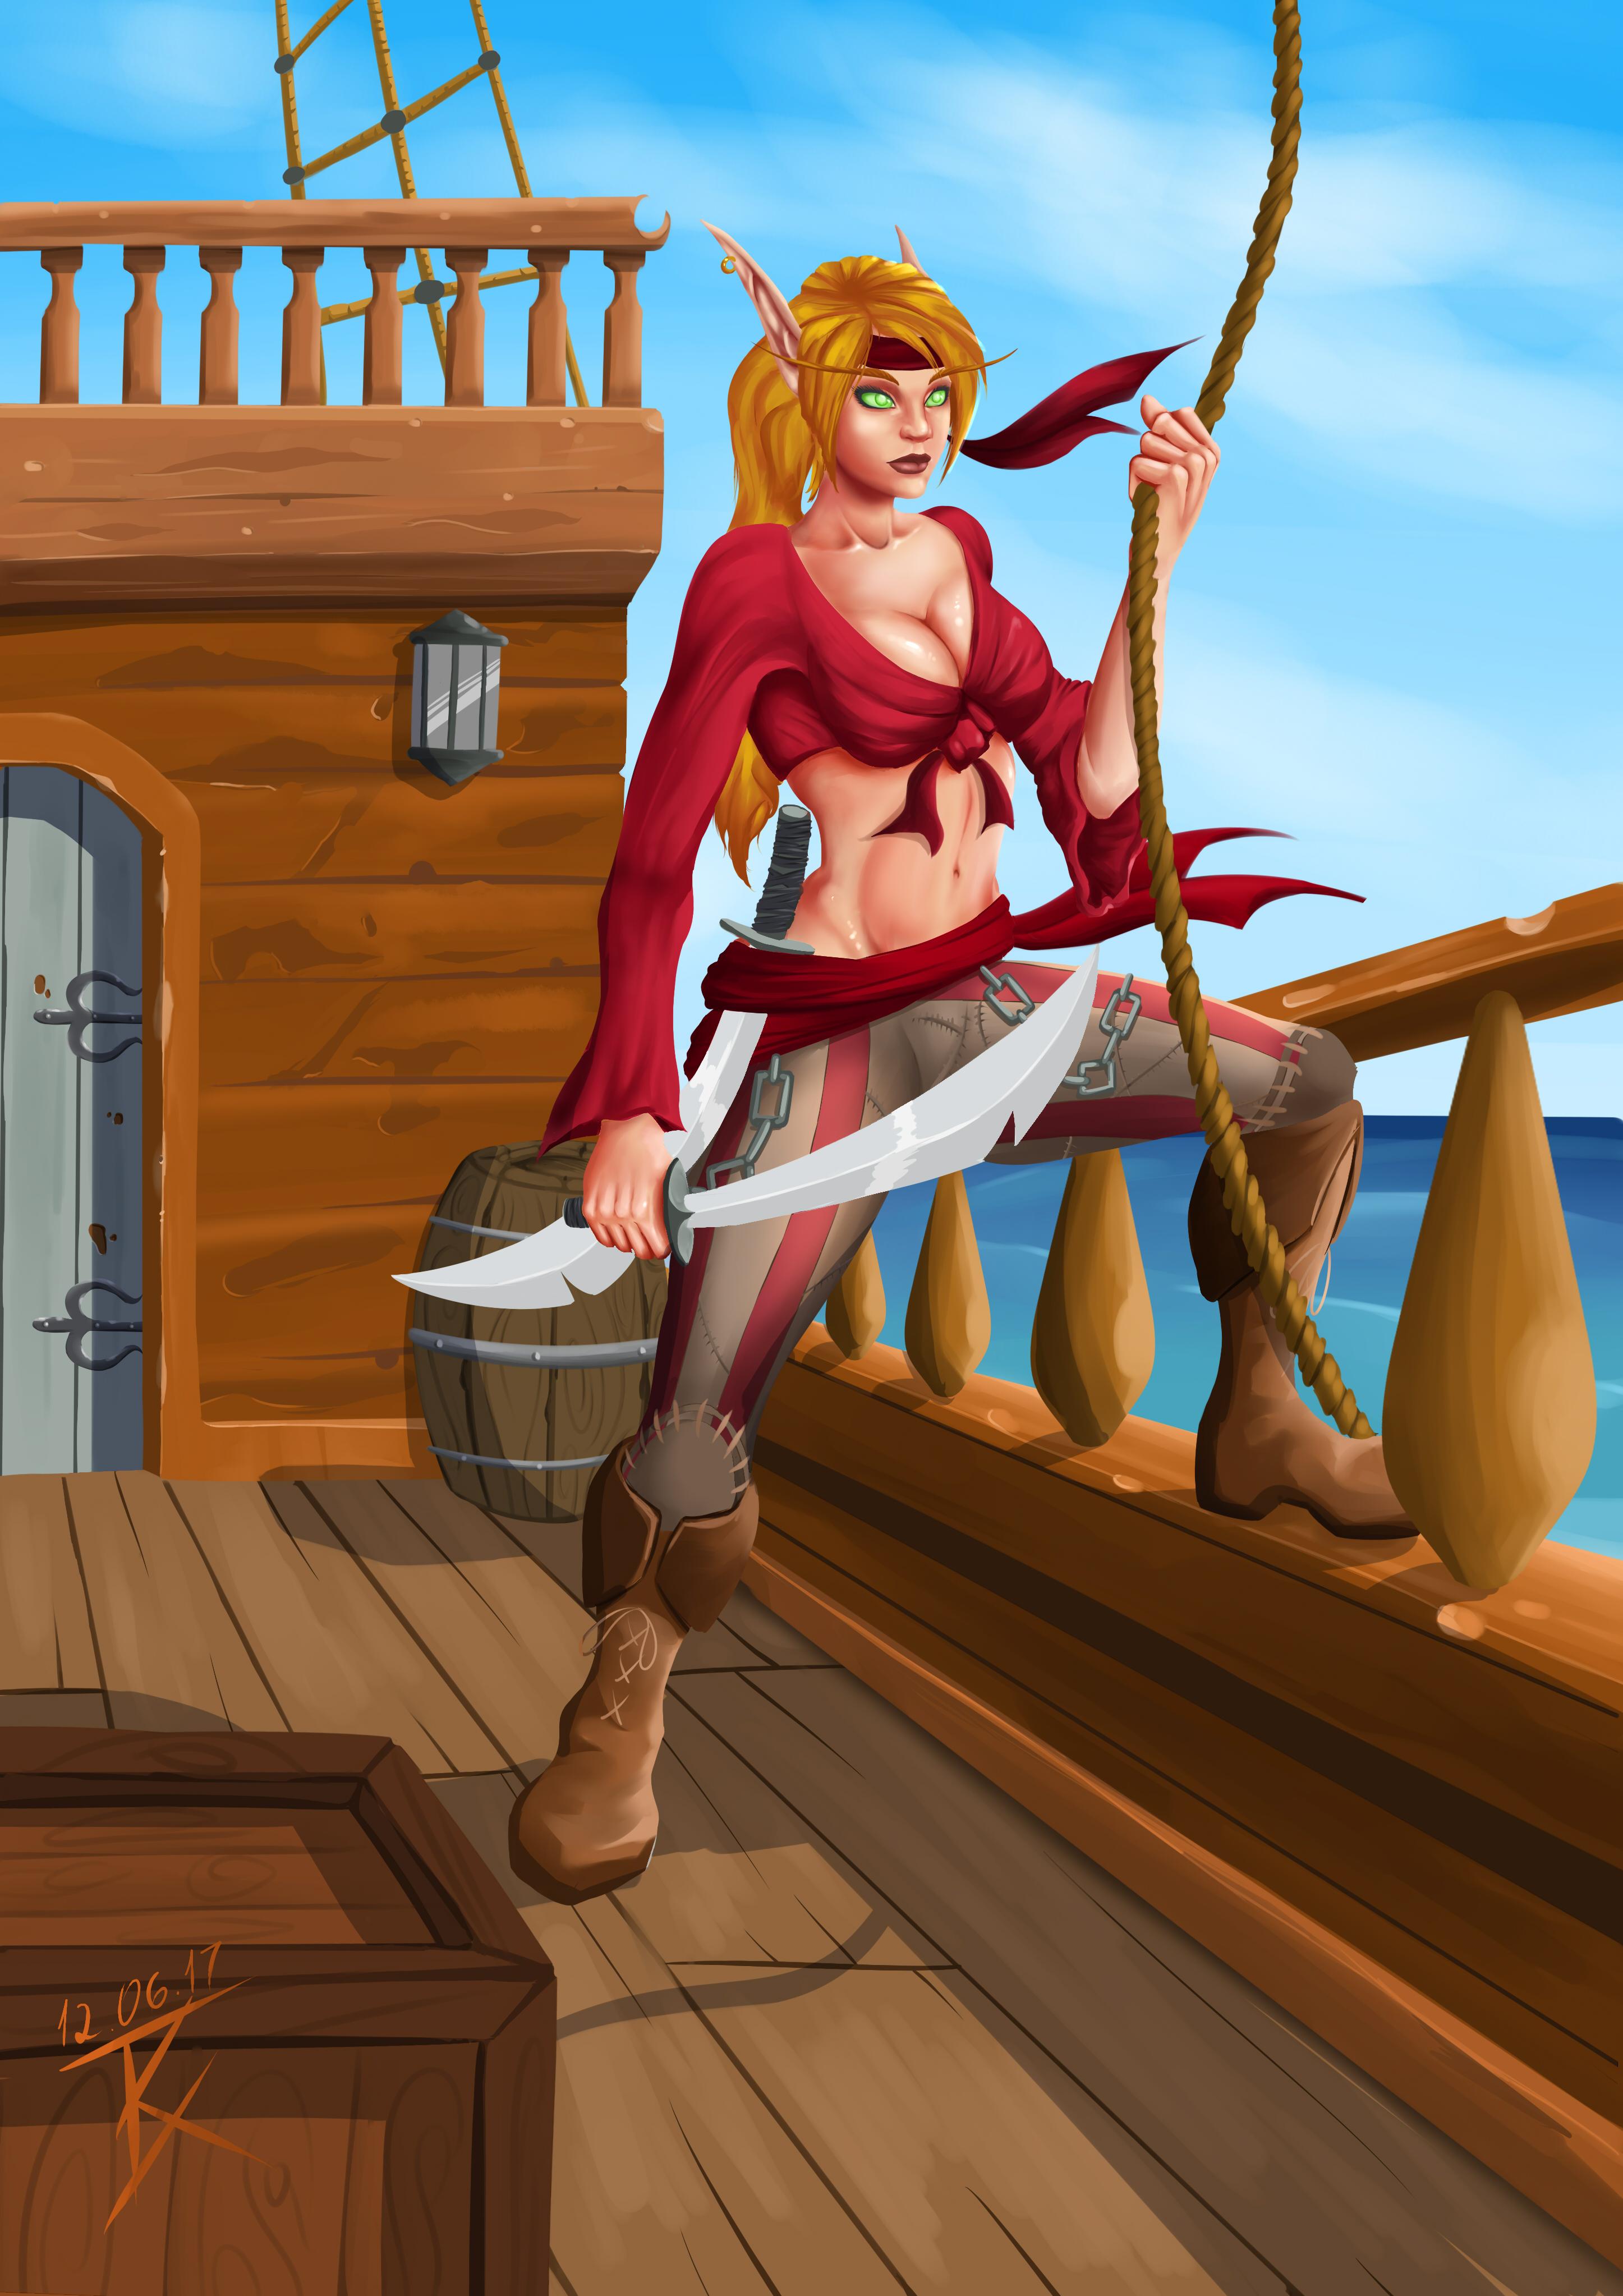 Pirate Shalis